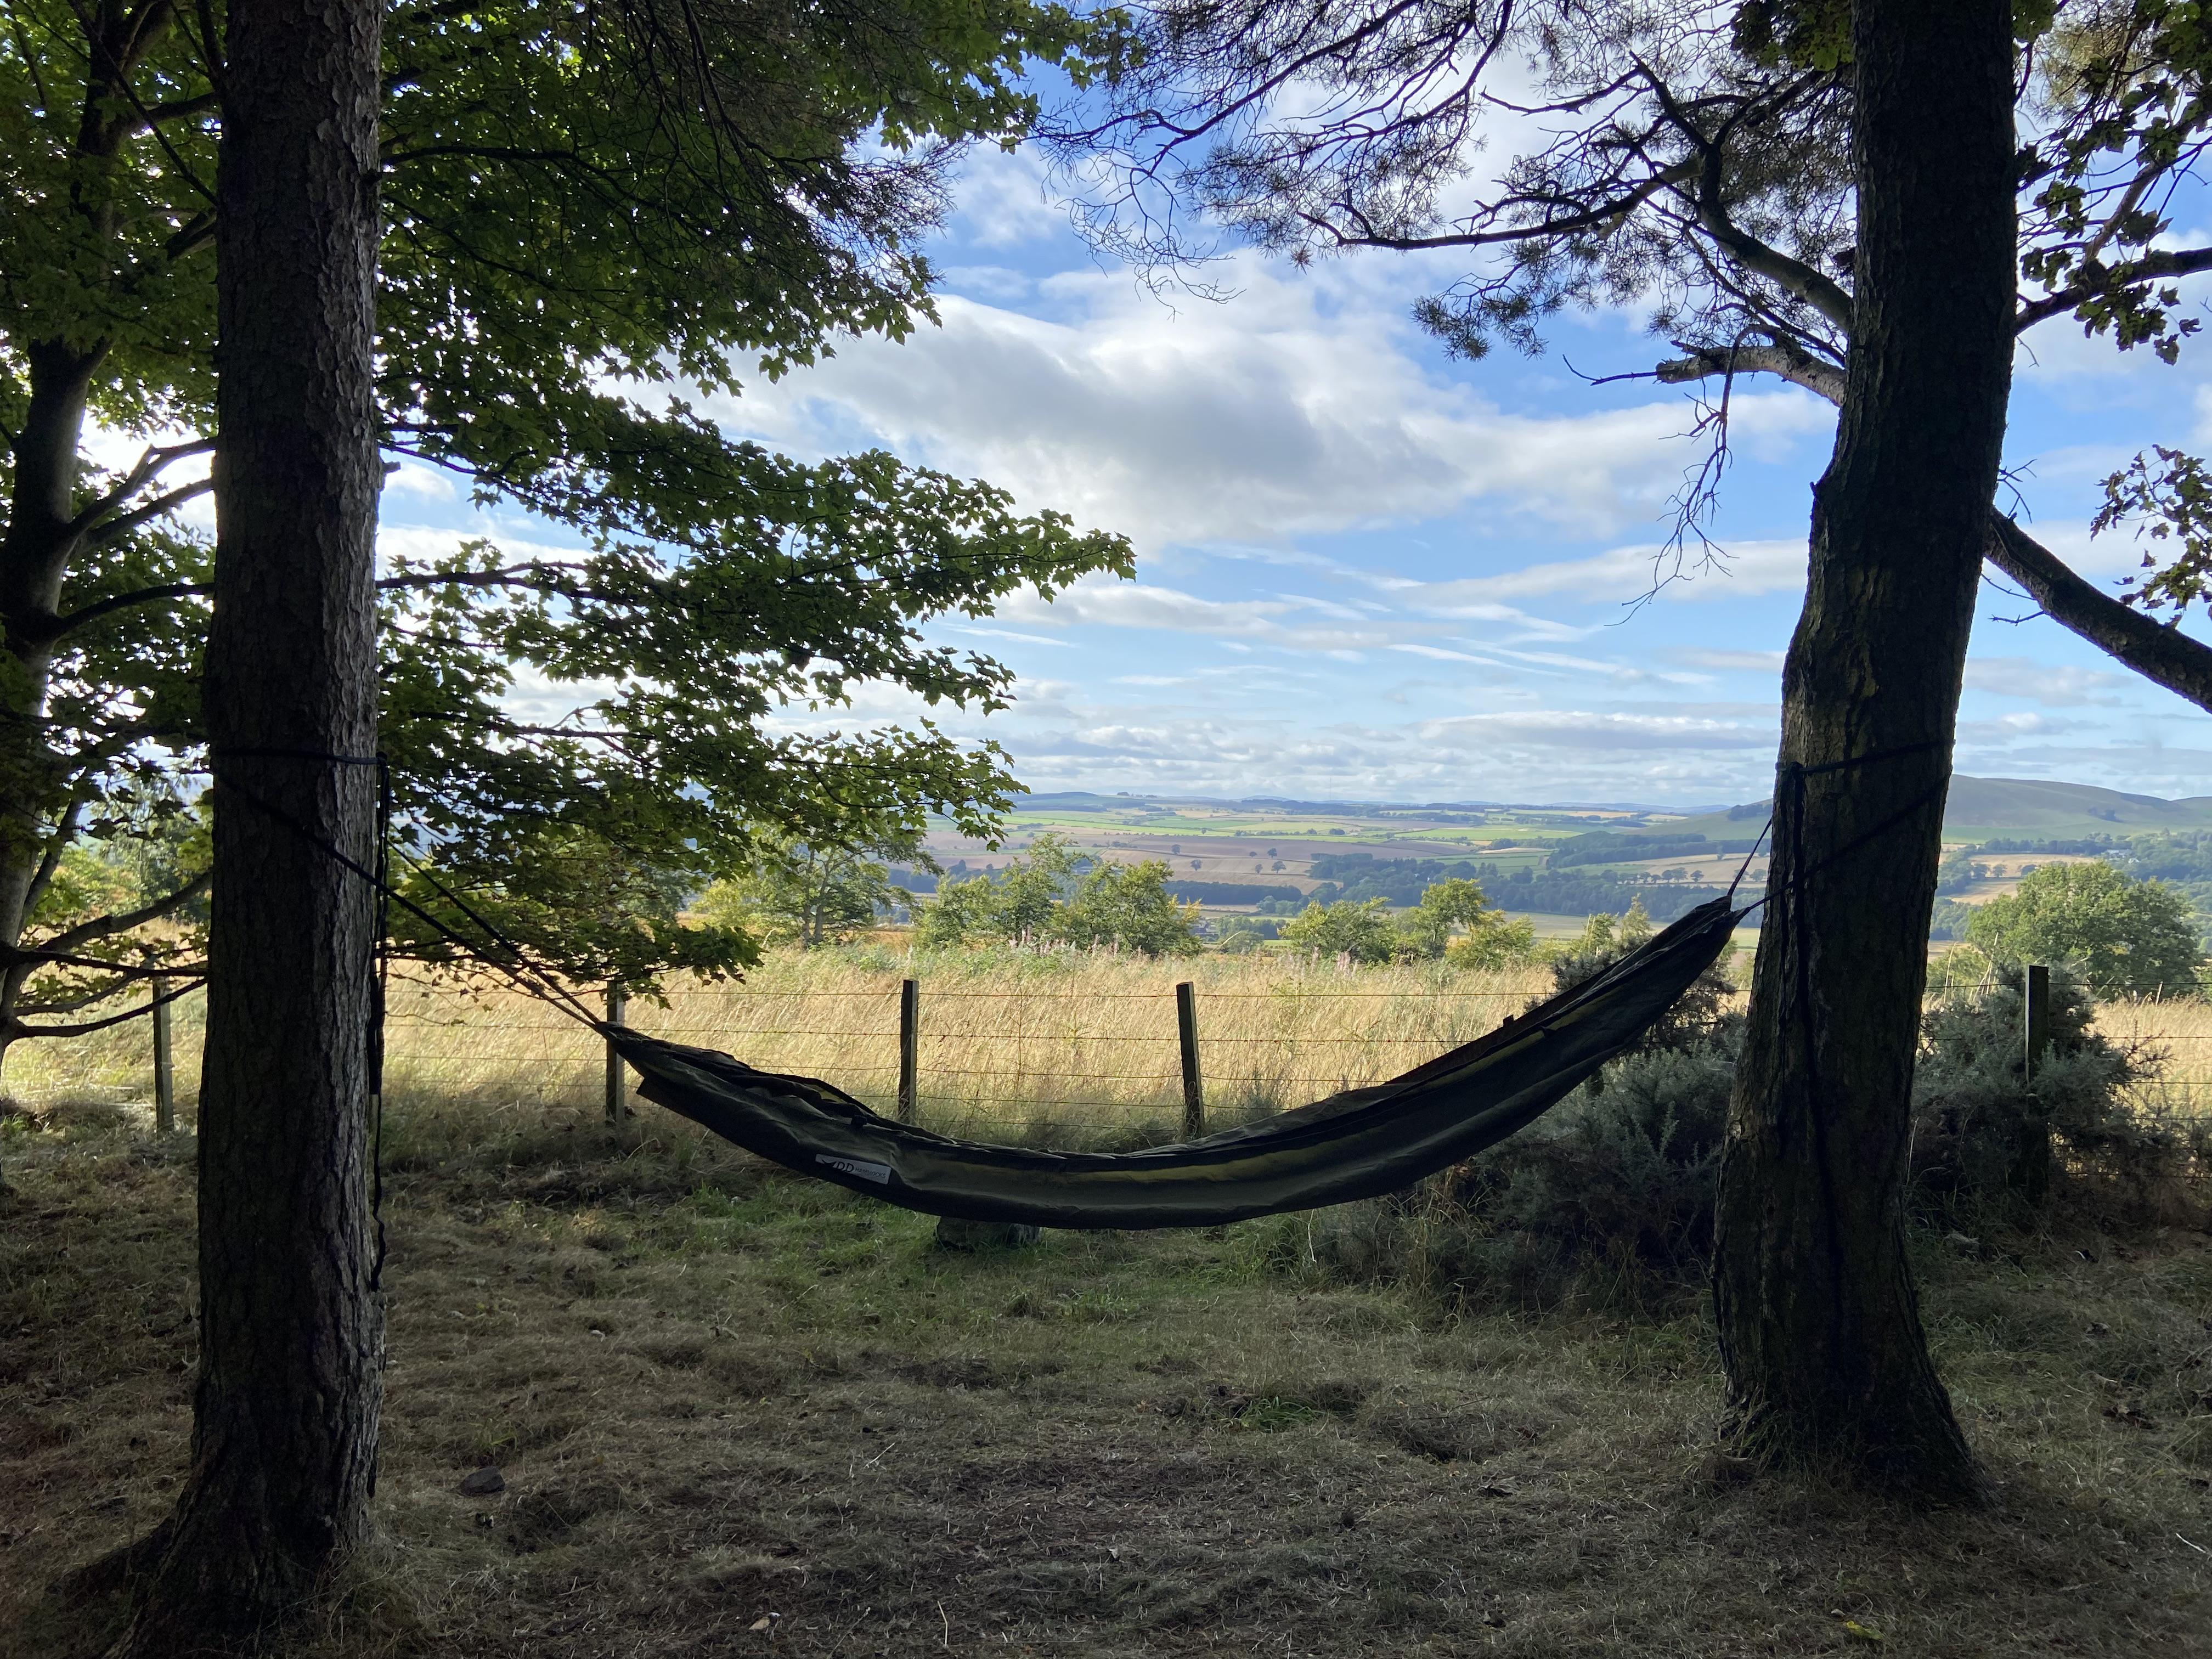 Photo of a hammock slung between two trees on Ruberslaw